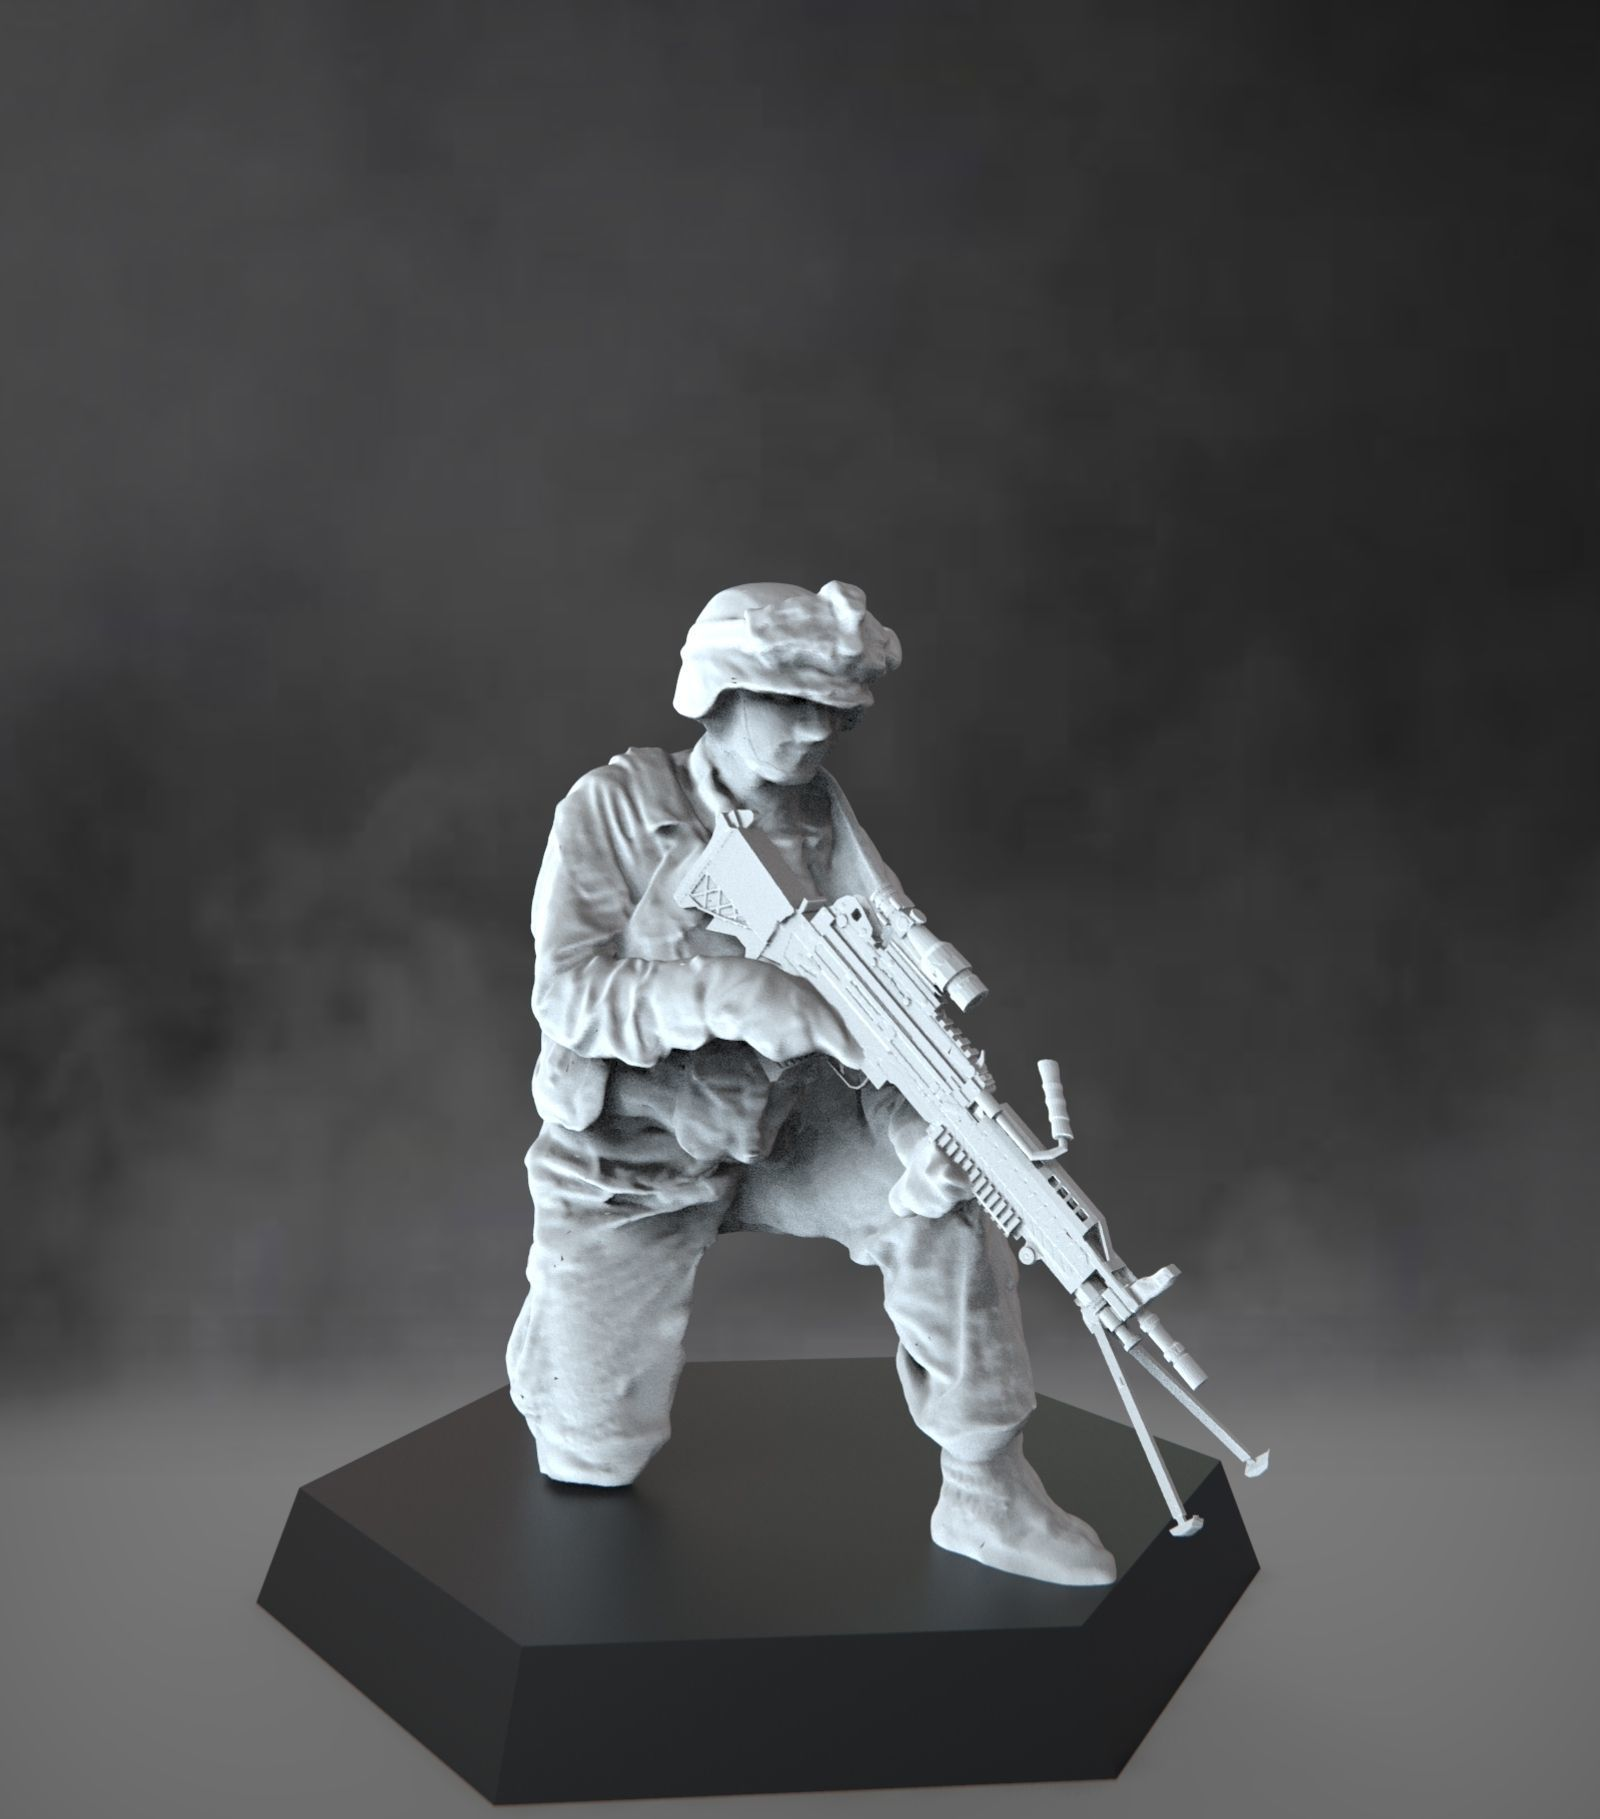 US Marine with light machine gun - USMC